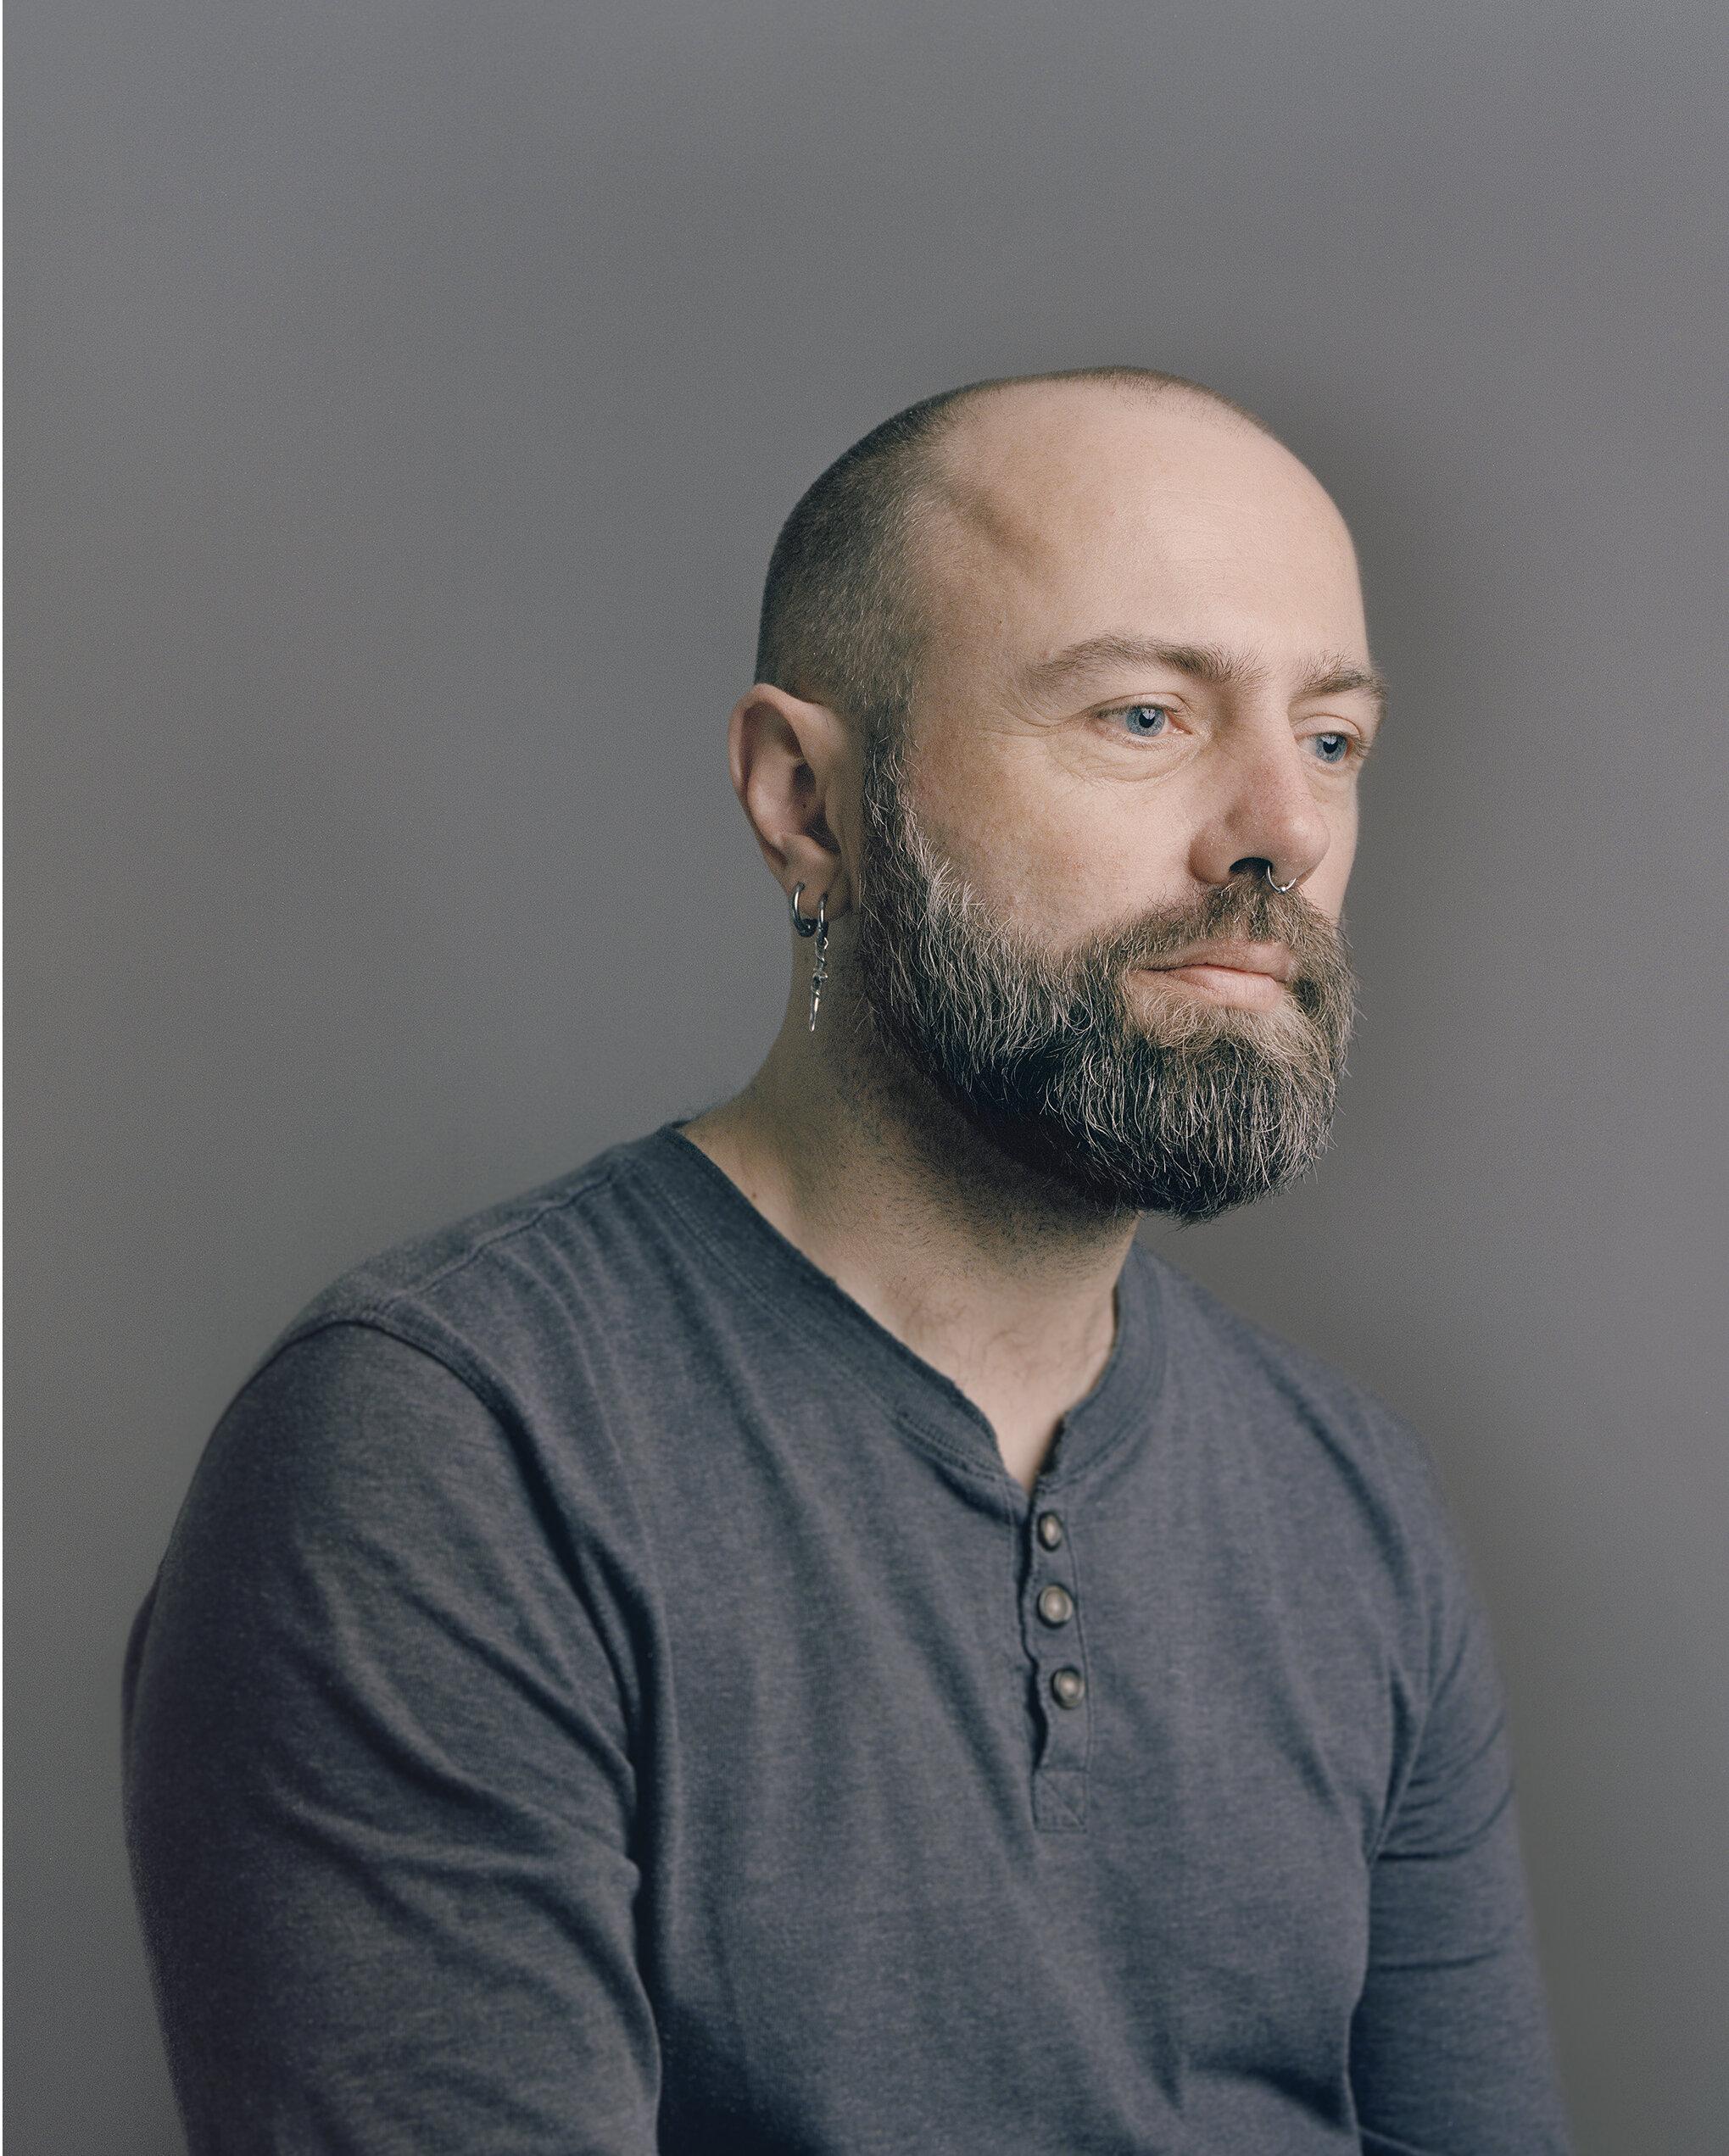 Ian Clifford, Ex-Christian Pastor